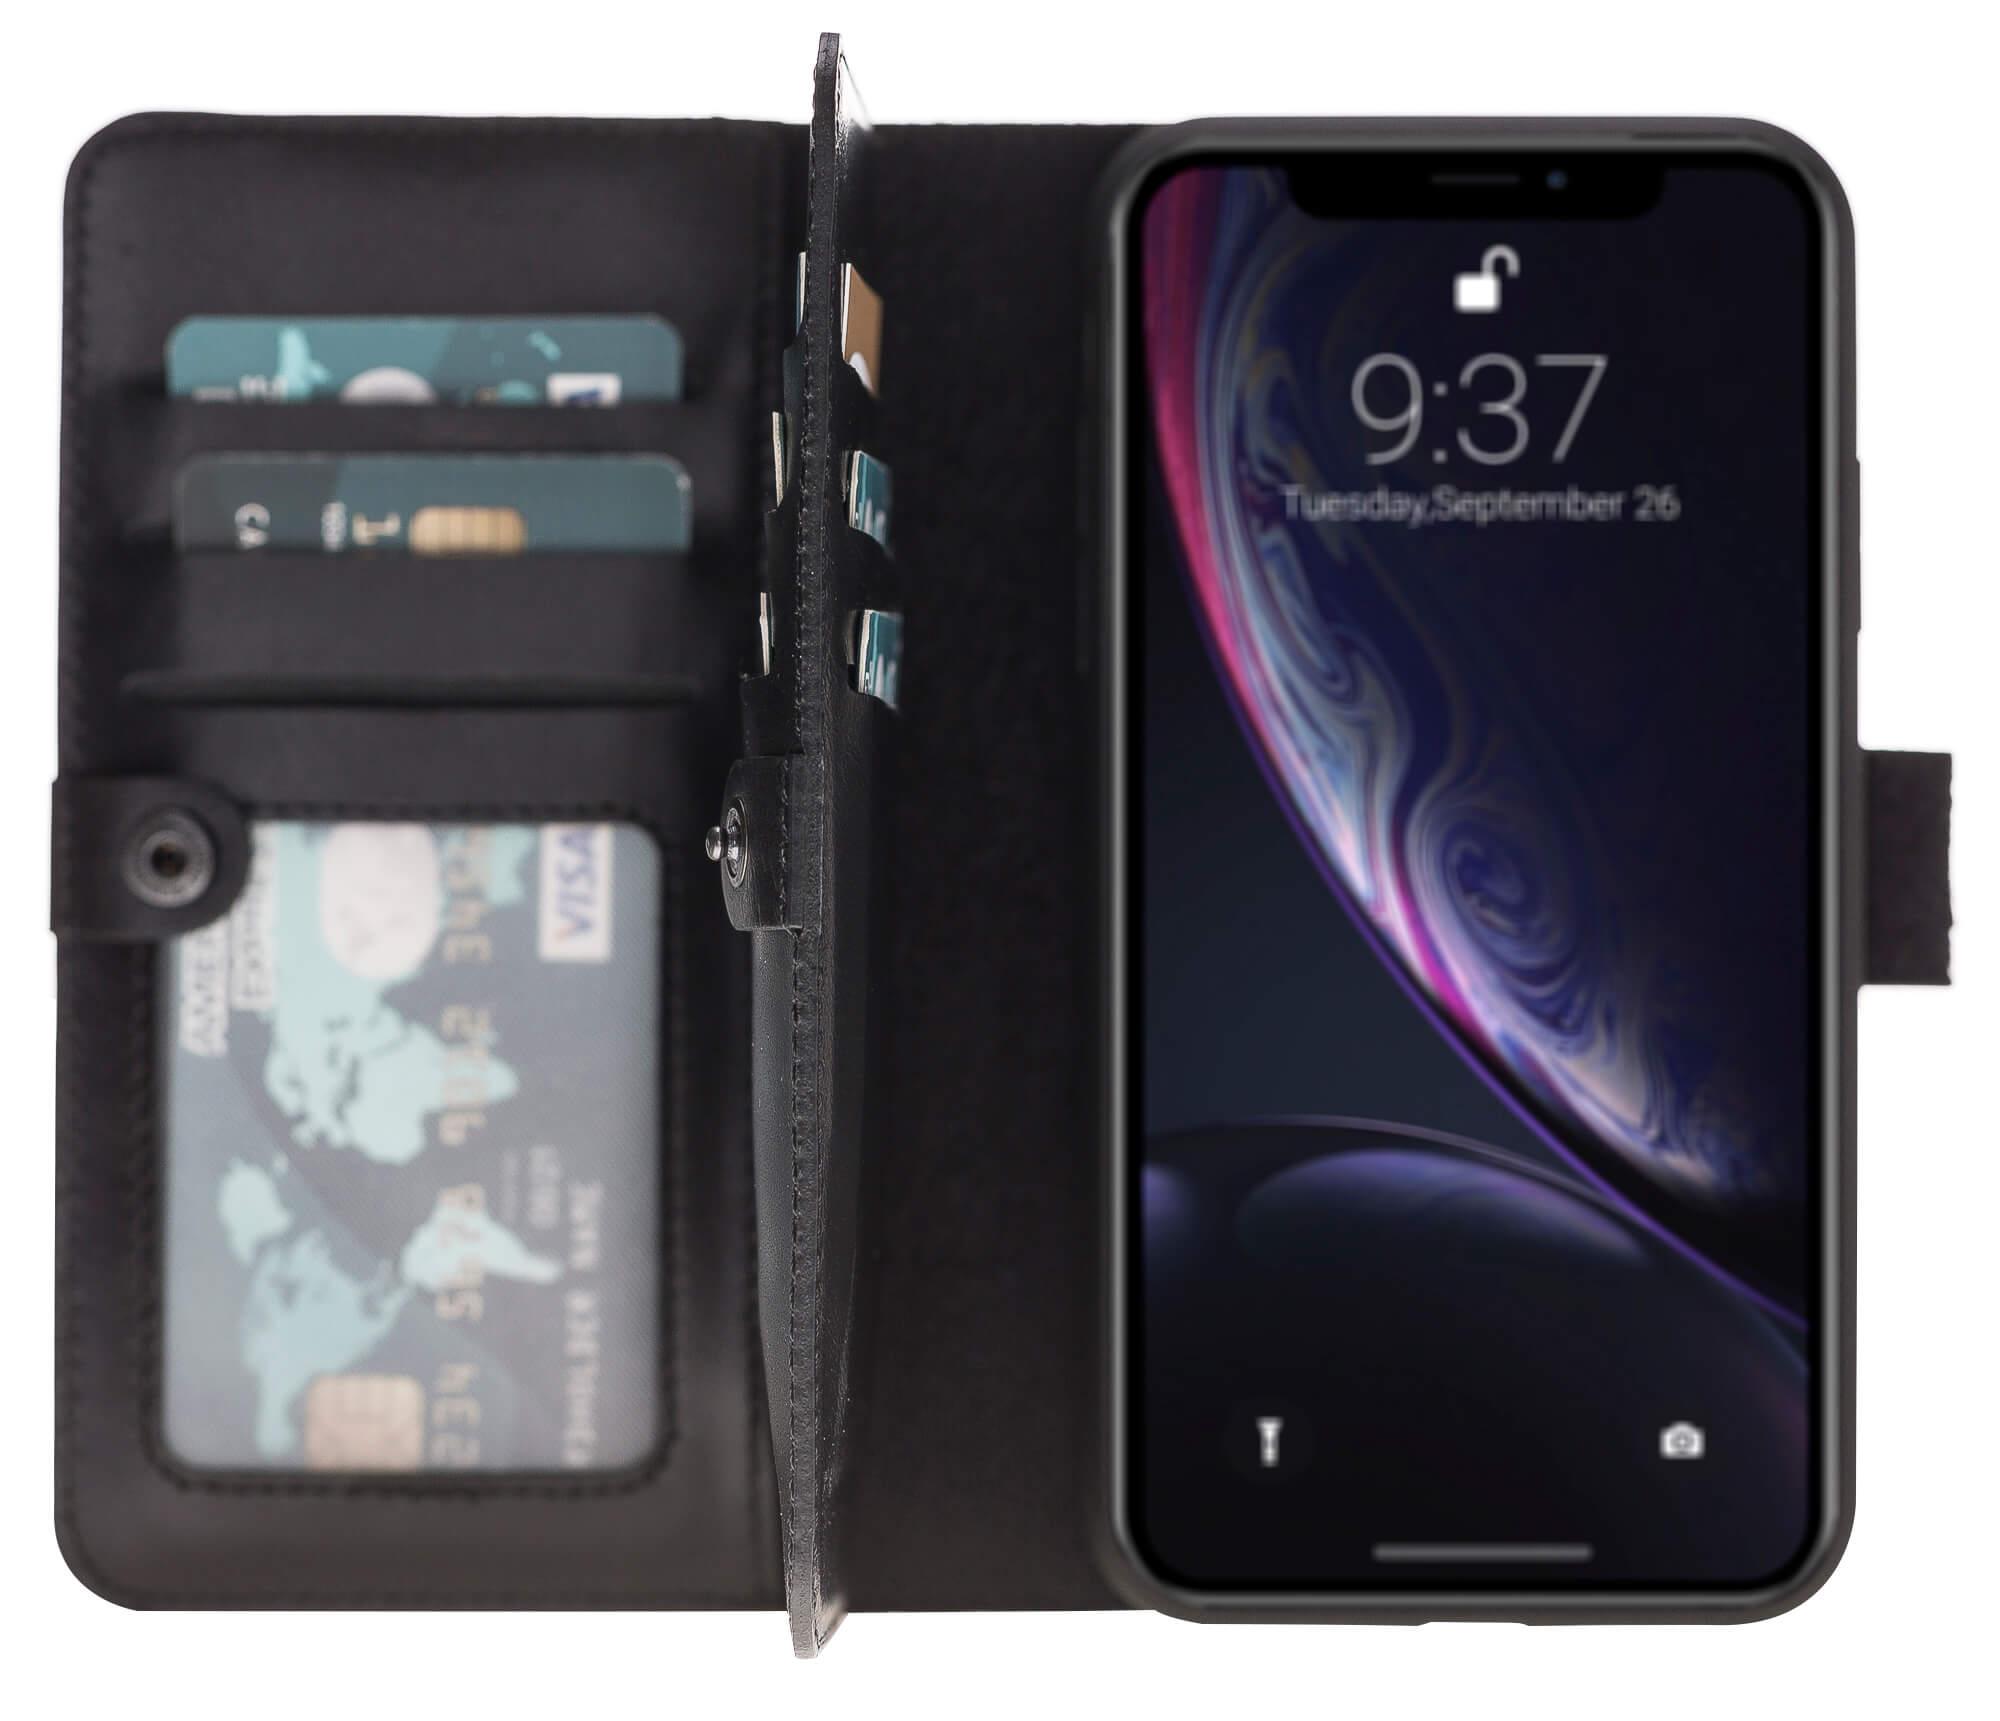 iPhone Xr abnehmbare Lederhülle (Double 2in1) inkl. Kartenfächer in Schwarz inkl. Edler Geschenkverpackung